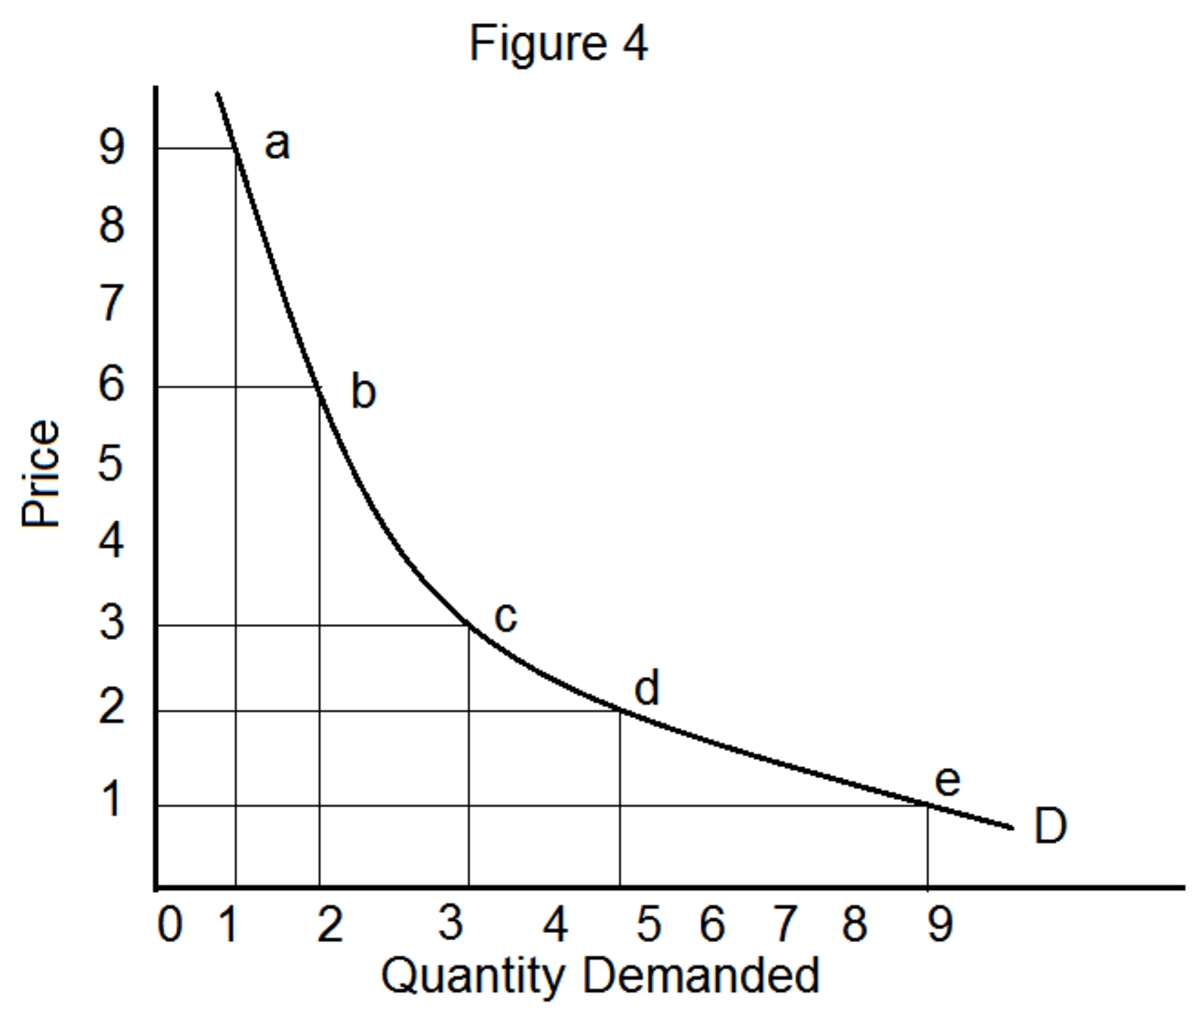 four-methods-of-measuring-price-elasticity-of-demand